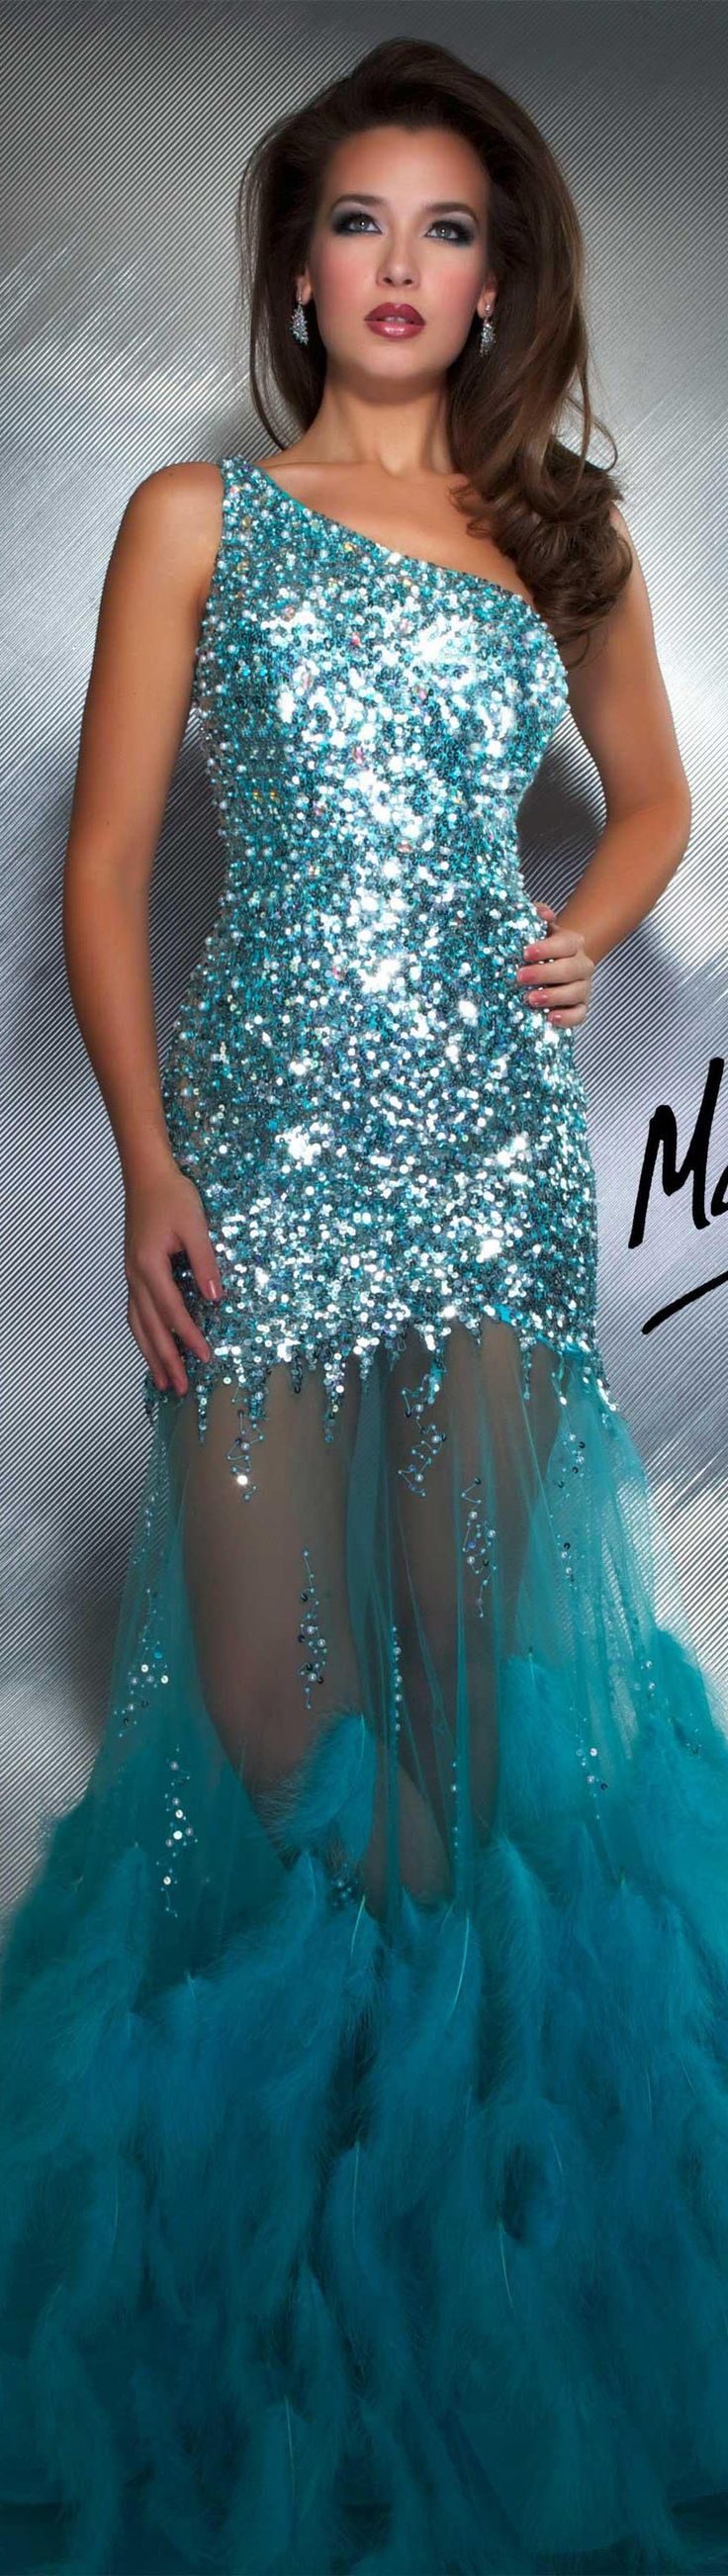 http://ura19627.wix.com/komanda Mac Duggal couture dress aqua, not really a costume but i love this dress